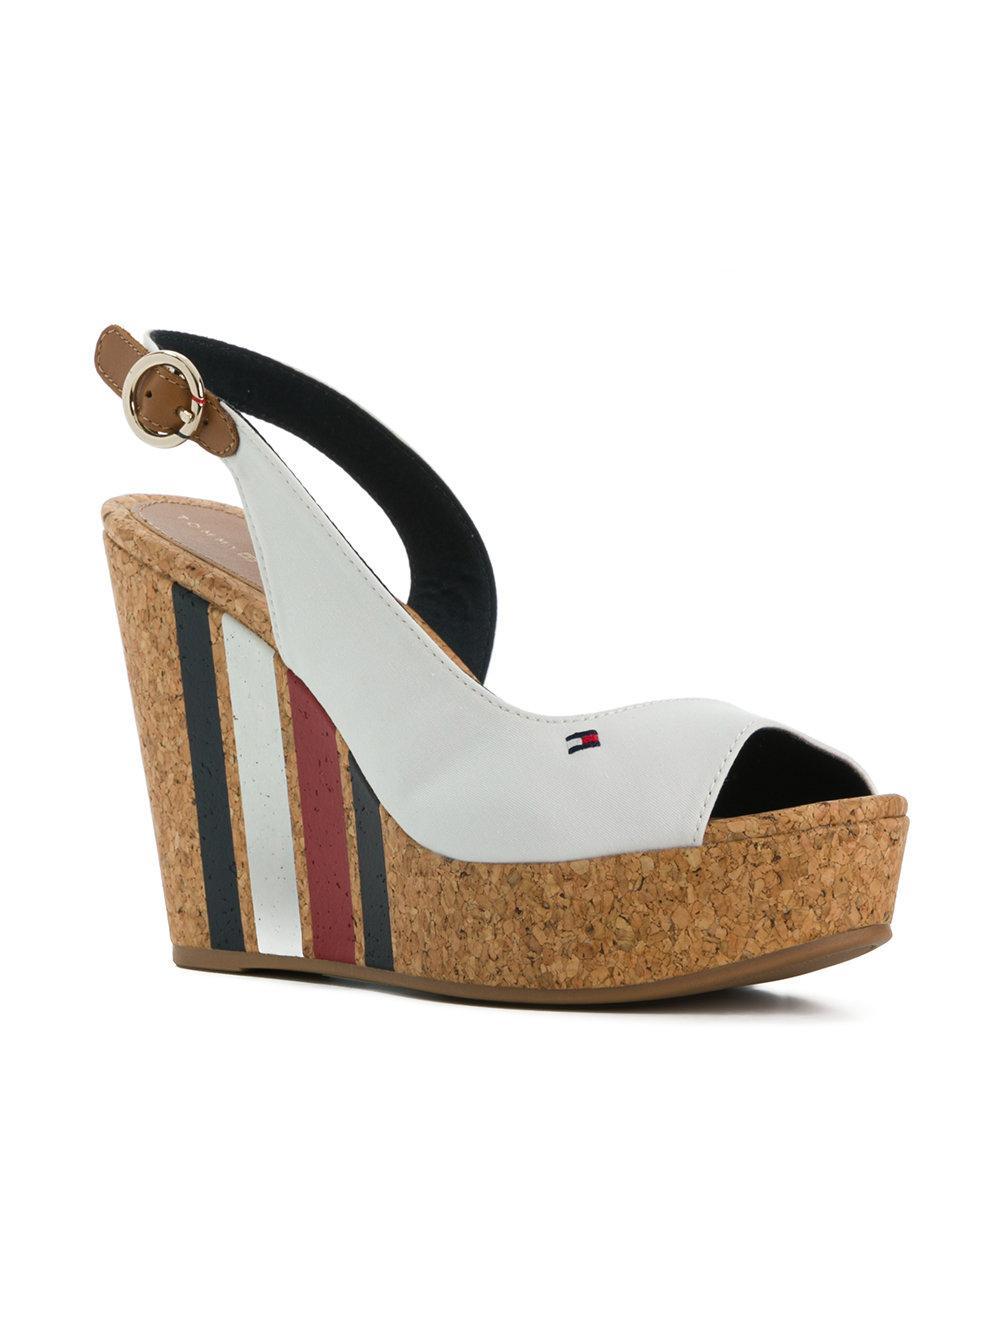 3da7d3f5a20 Tommy Hilfiger Striped Wedge Heel Sandals in White - Lyst